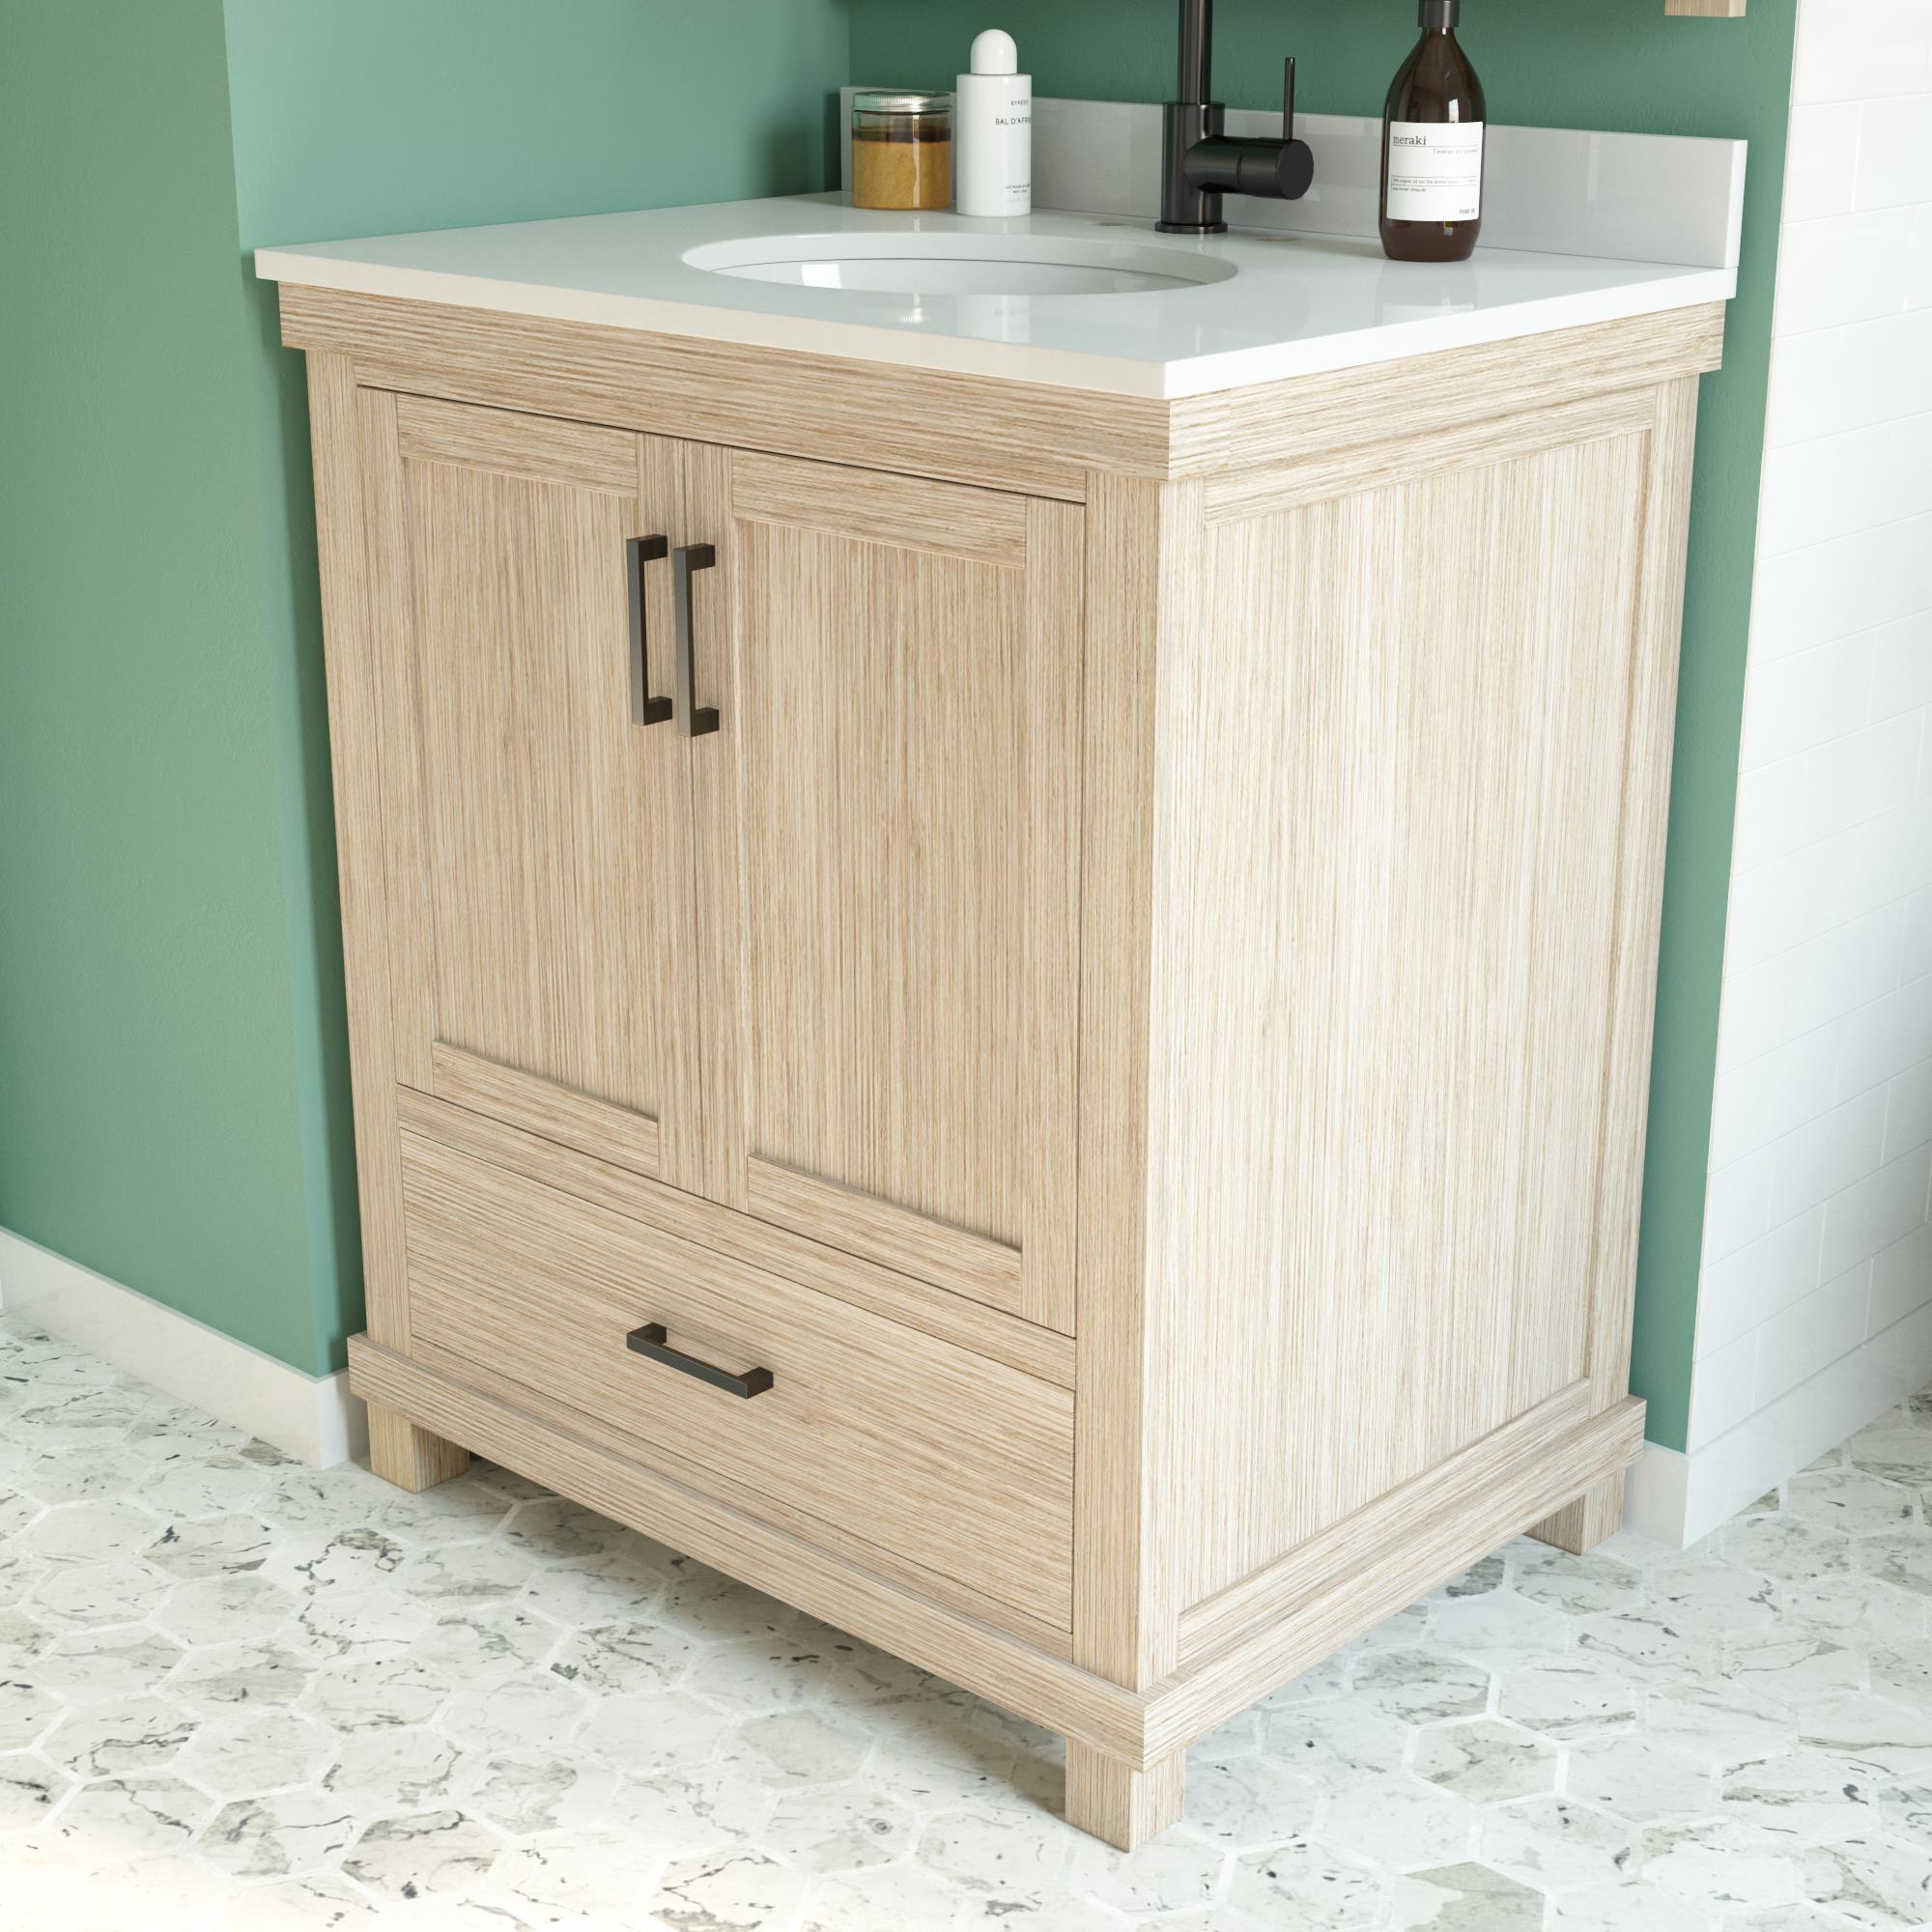 Dorel Living Sunnybrooke 30 Inch Bathroom Vanity W Sink Rustic White Walmart Com Walmart Com